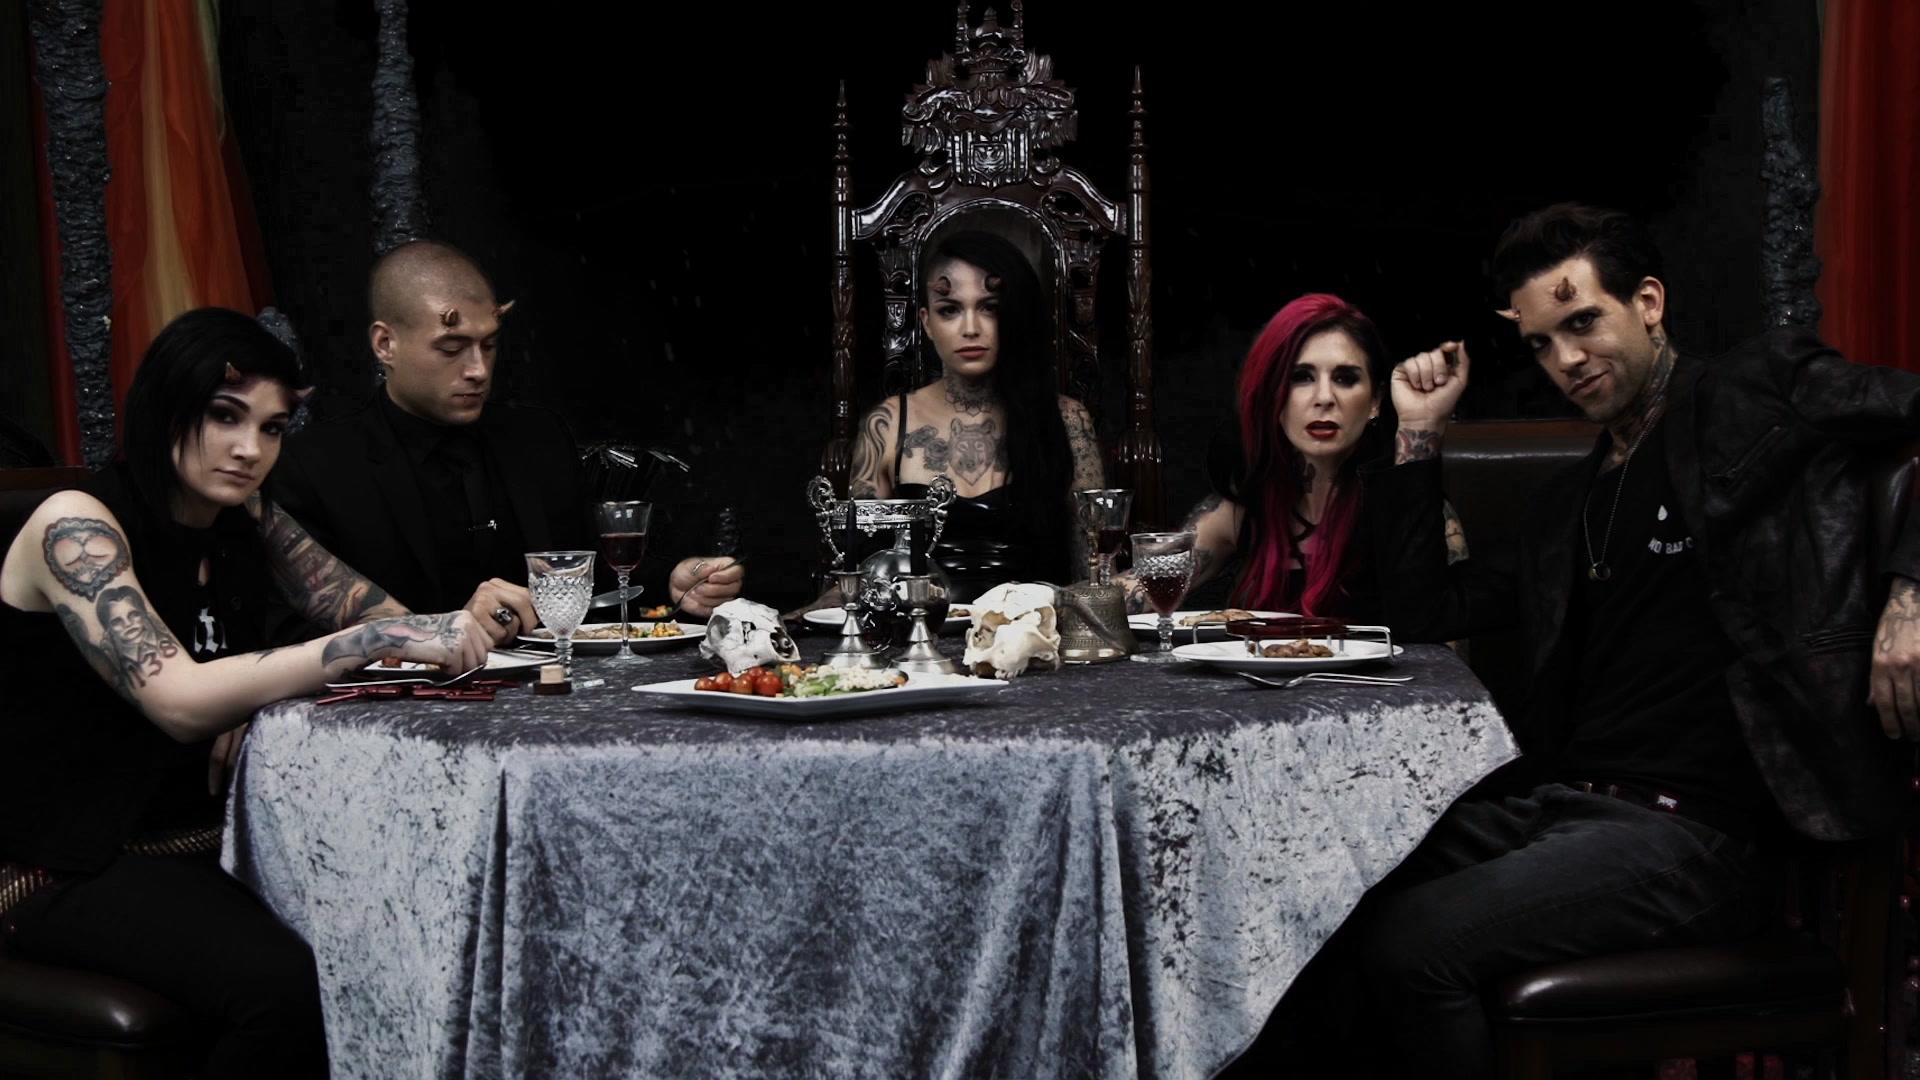 Scene with Joanna Angel, Xander Corvus and Ophelia Rain - image 18 out of 20